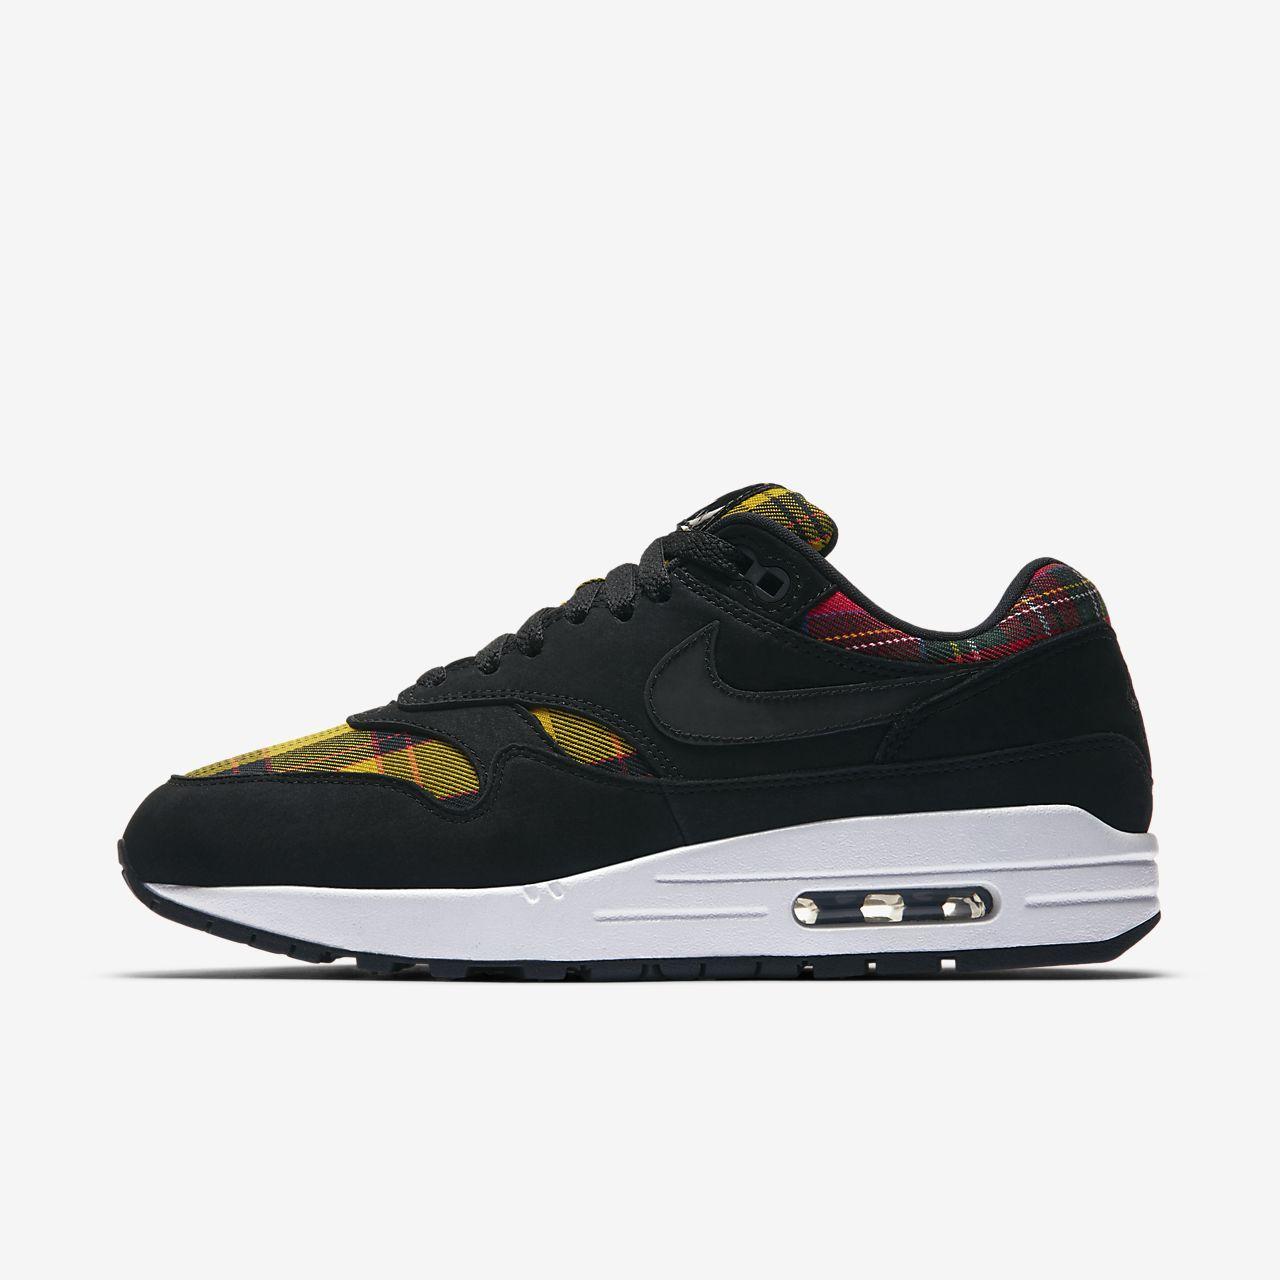 Nike Air Max 1 SE 女子运动鞋